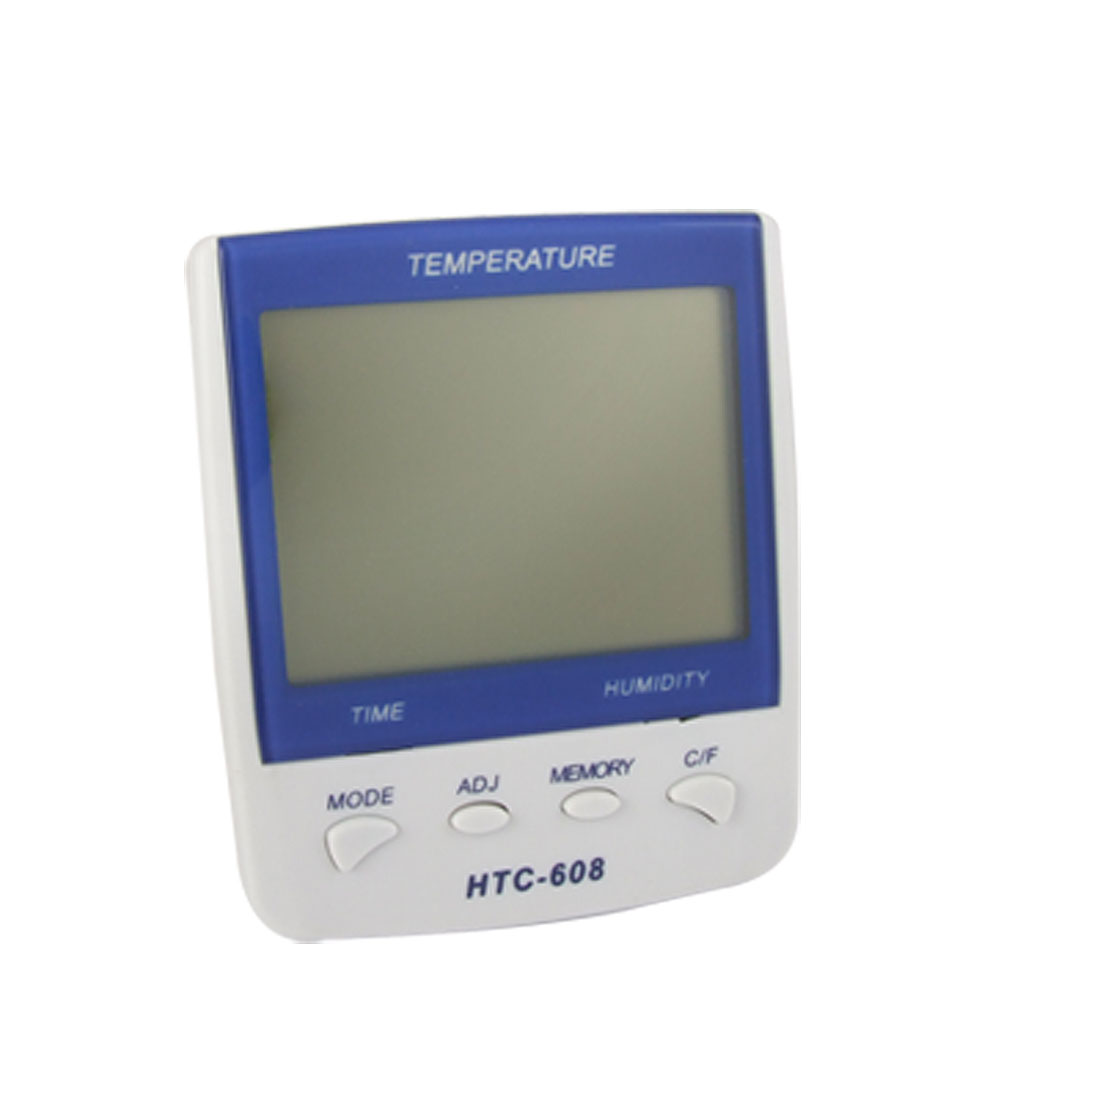 Digital Calendar Alarm Clock Temperature Humidity Meter Blue White